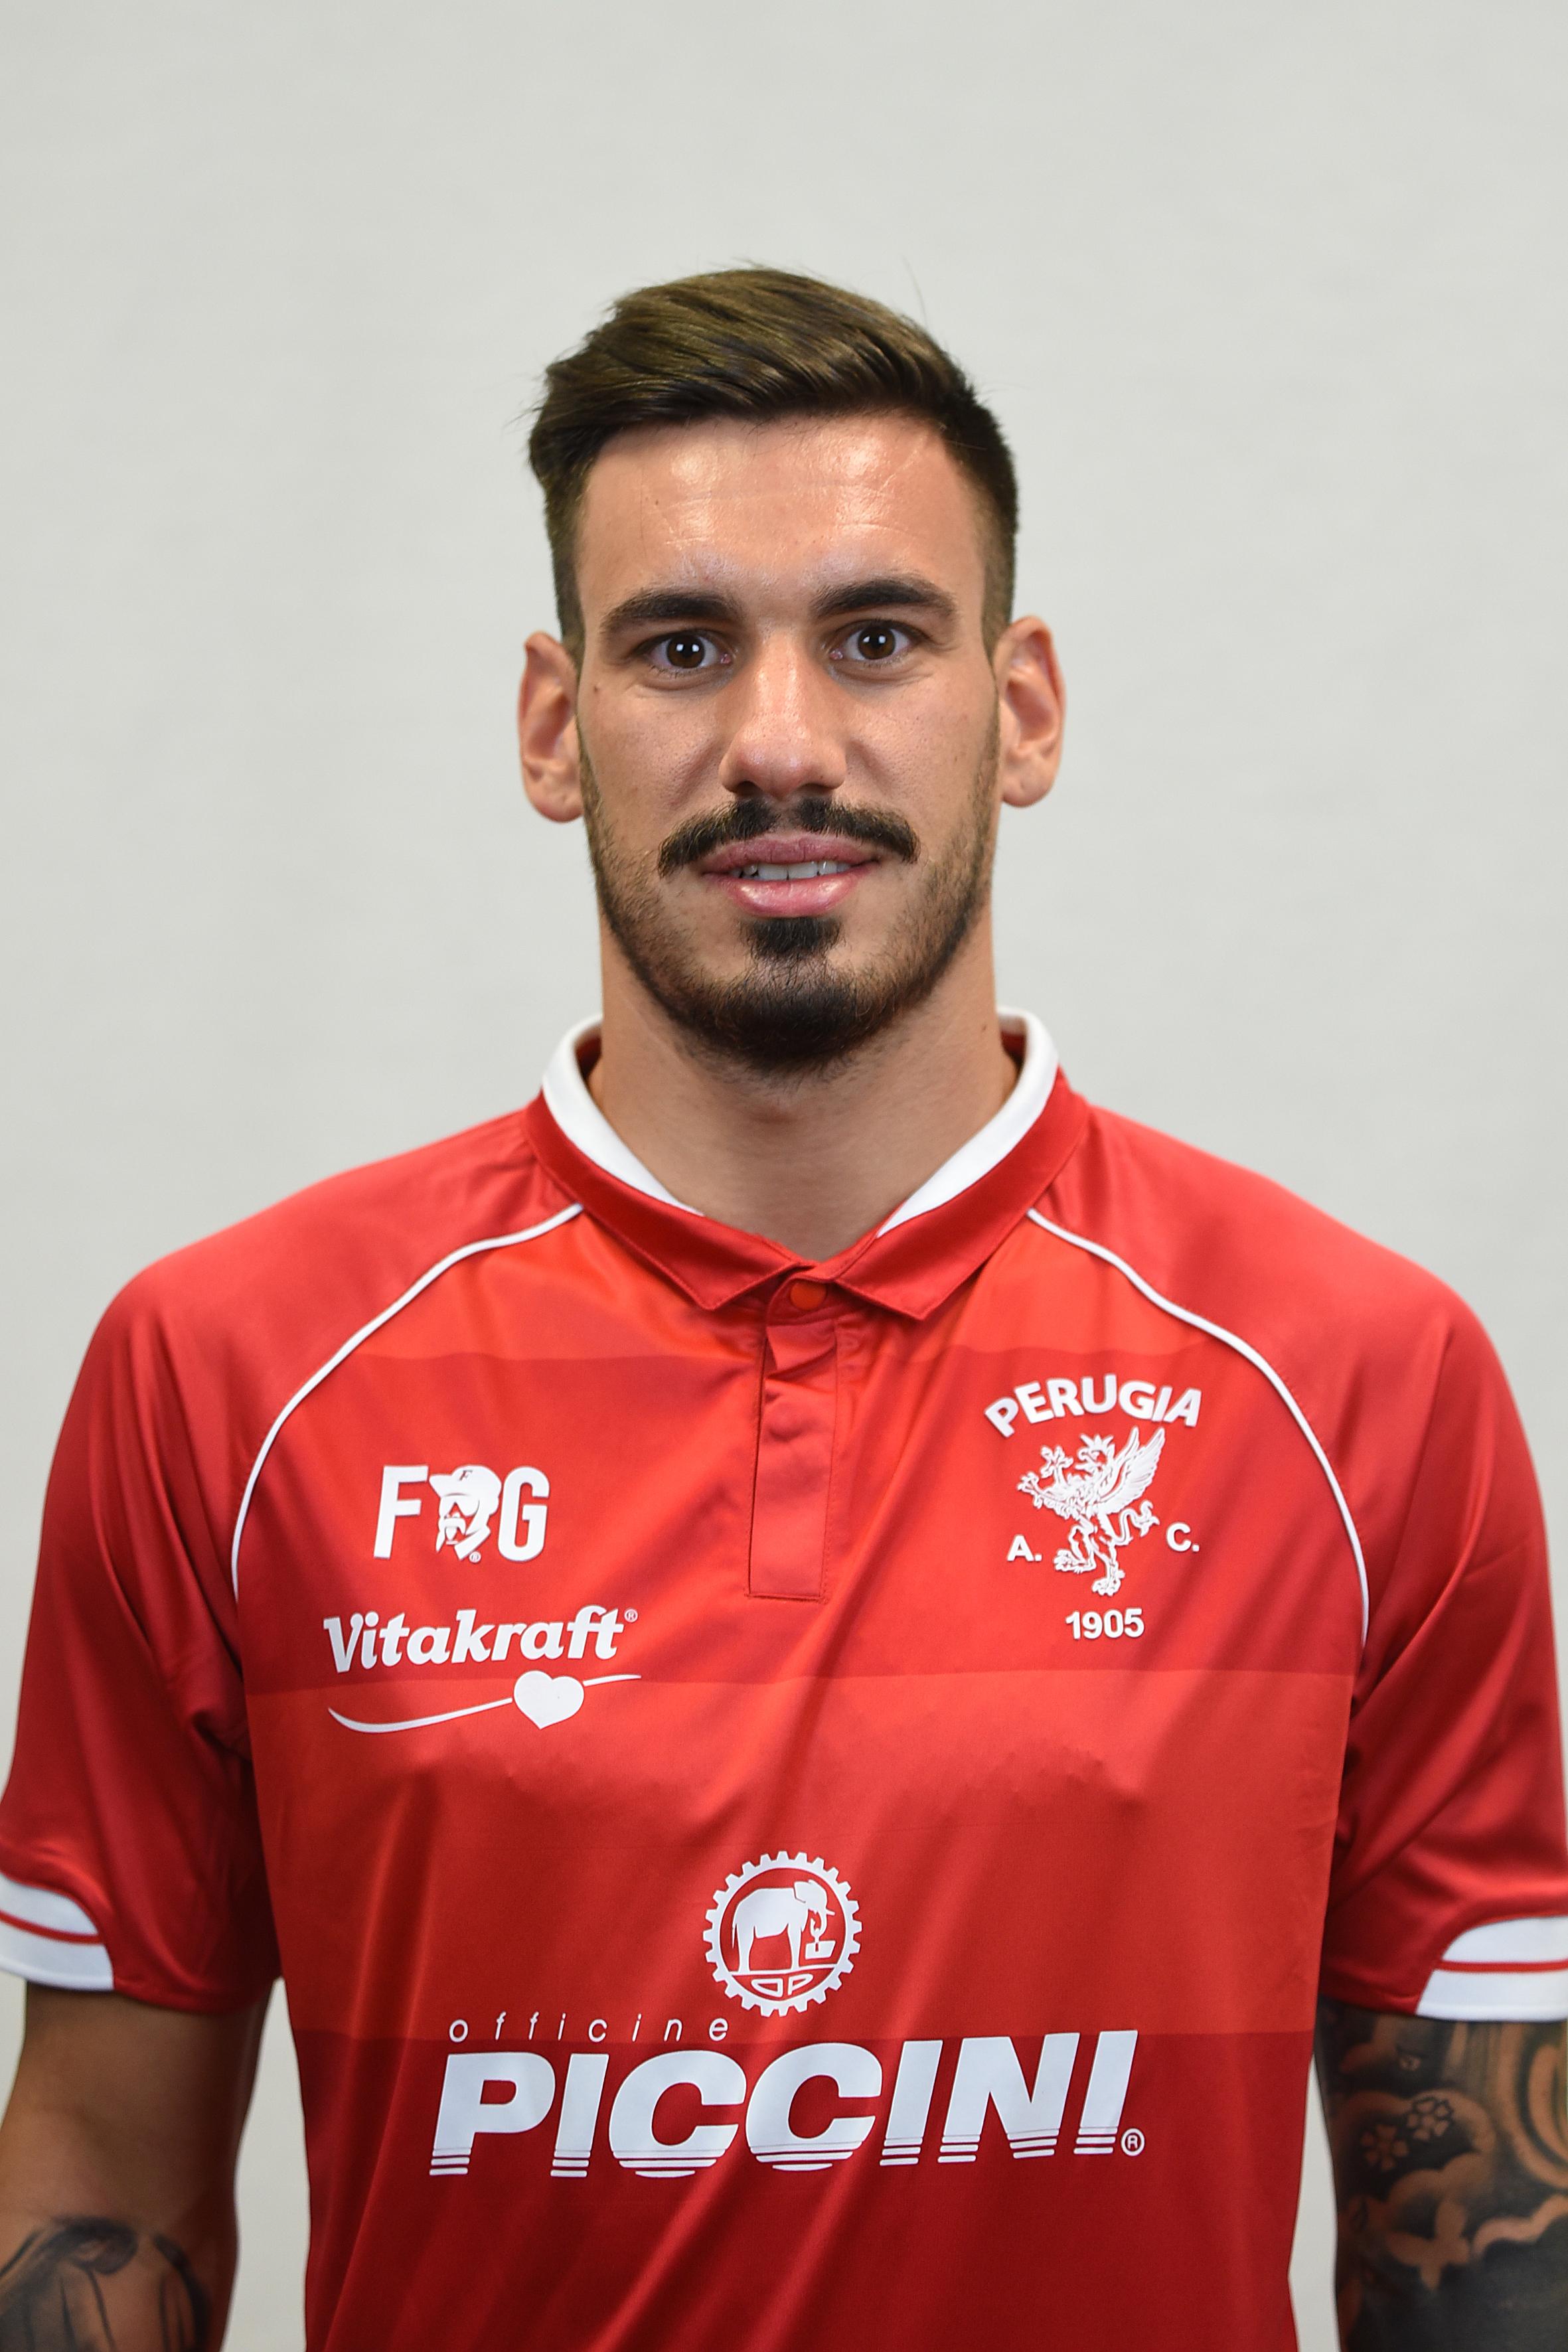 Nicola FalascoDifensore- A.C. Perugia Calcio